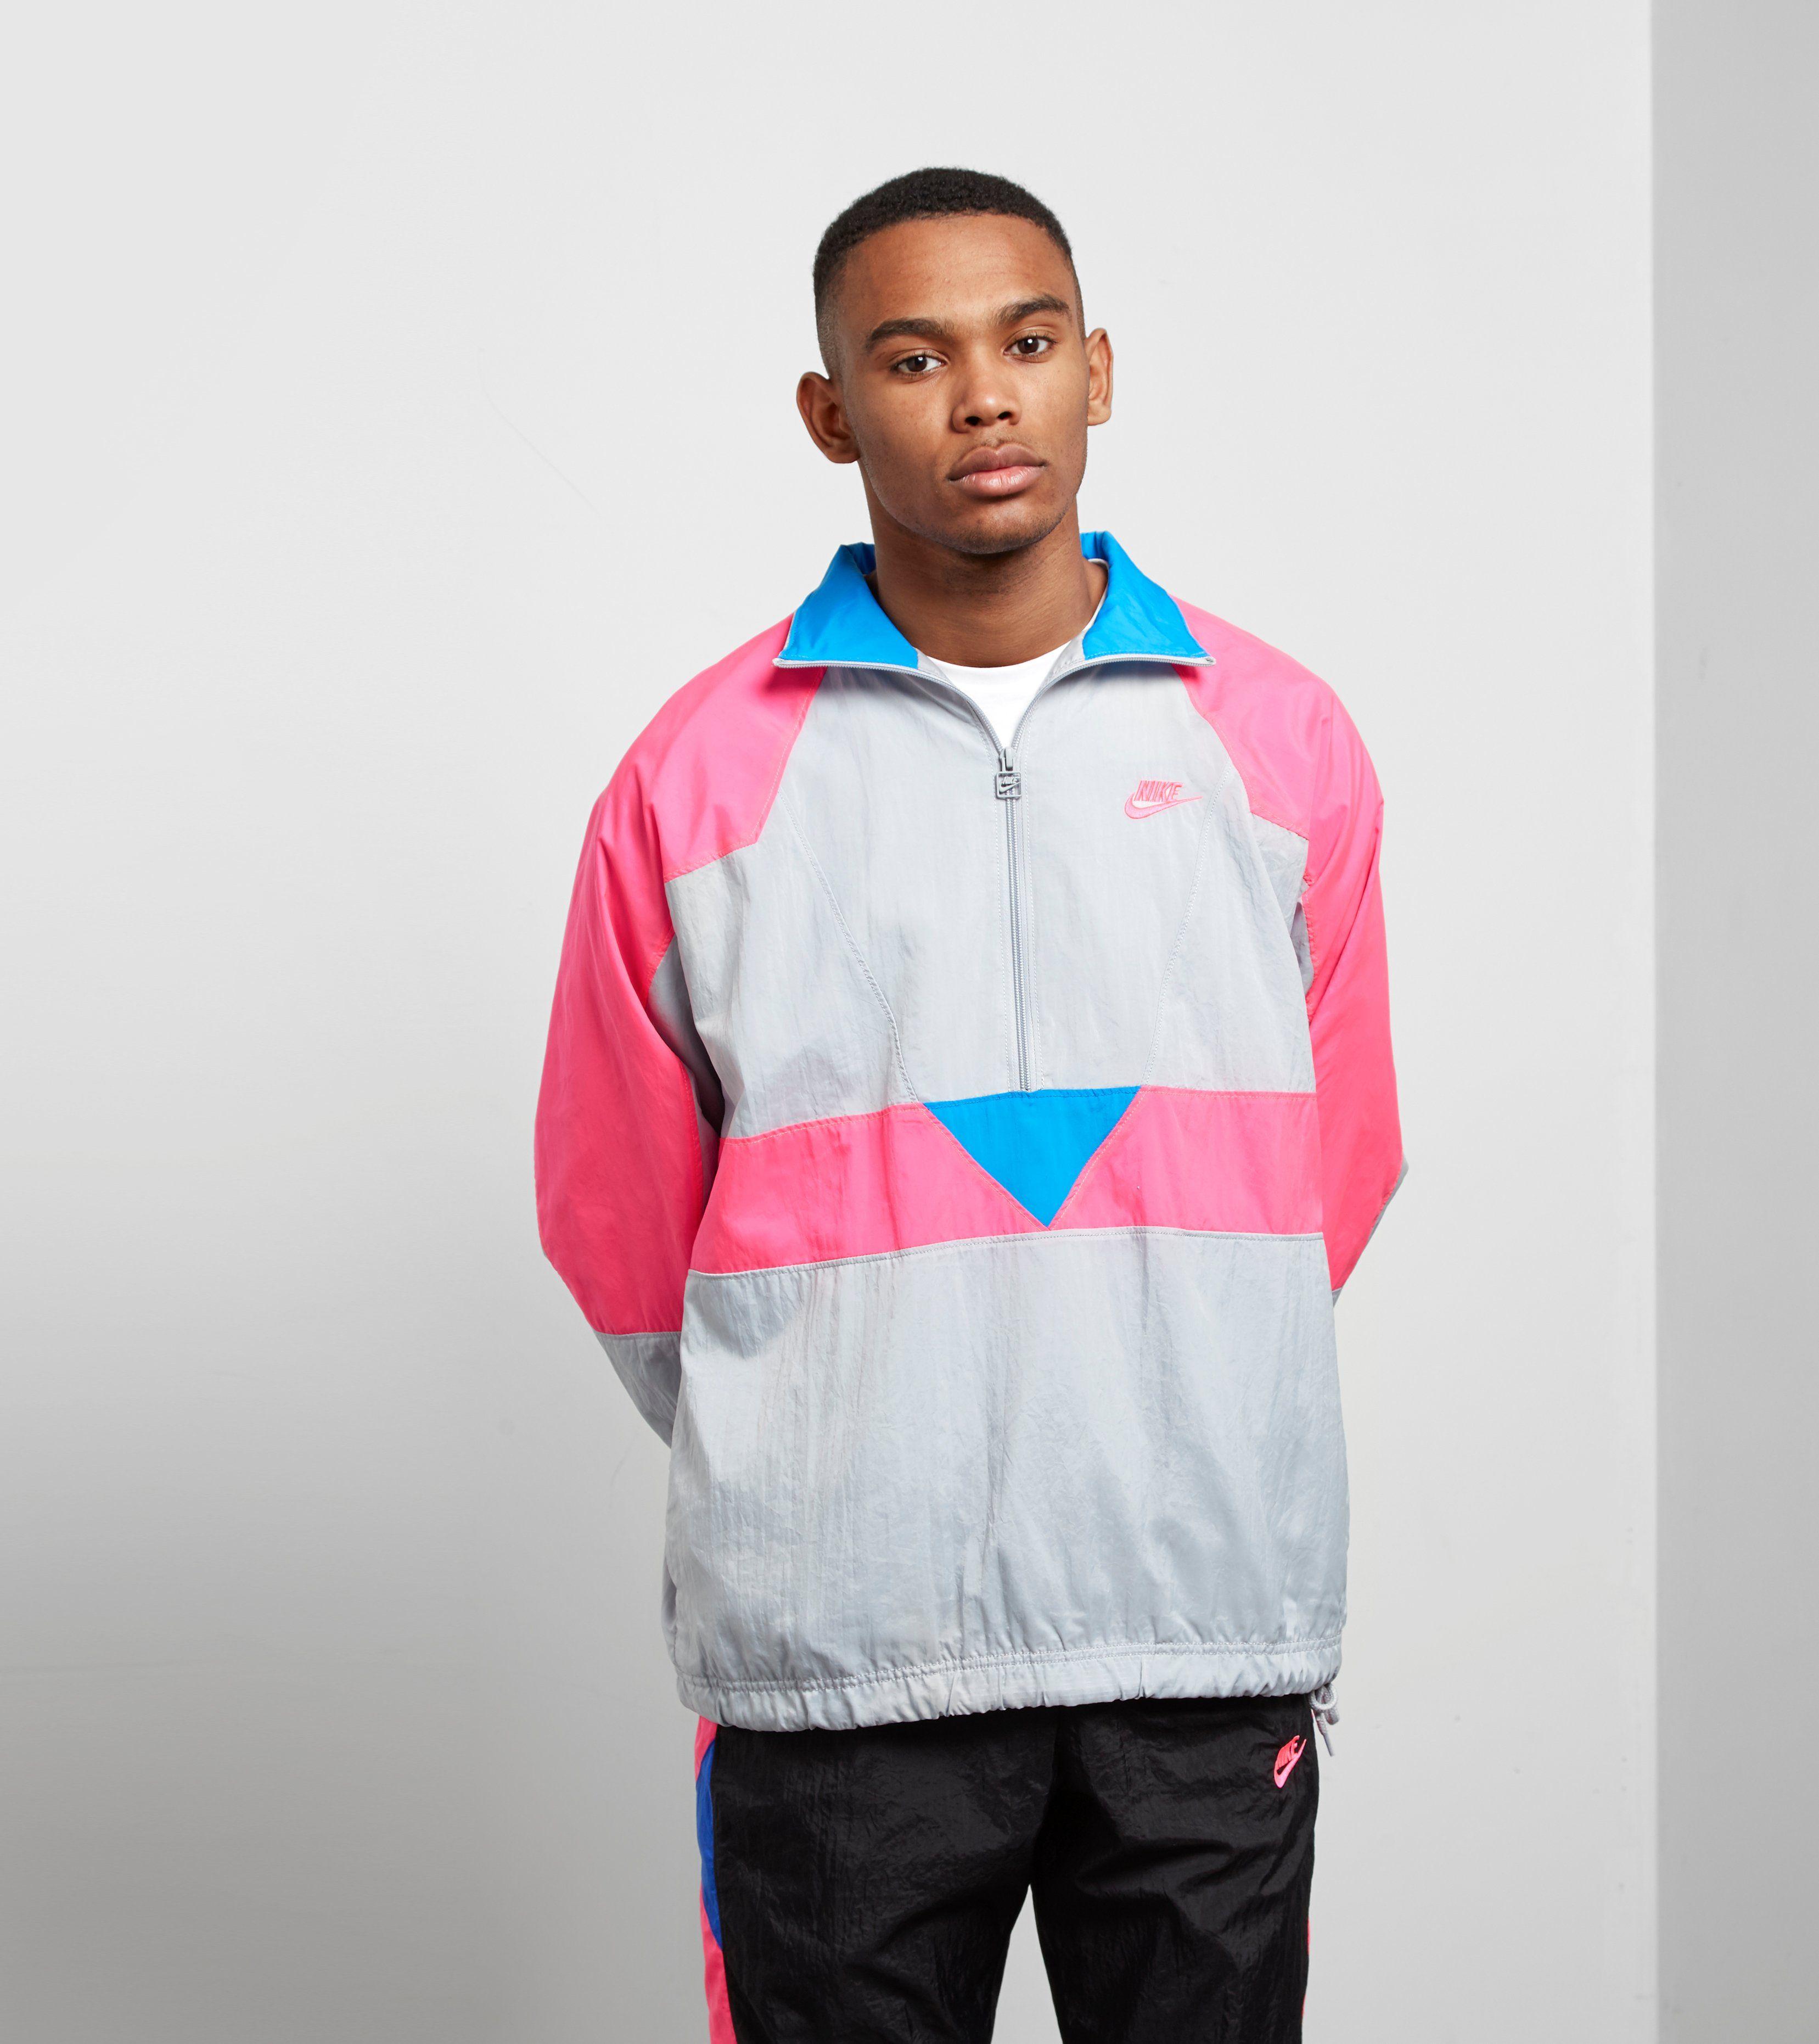 8c8096e6eb96 Nike Vaporwave Half Zip Woven Jacket